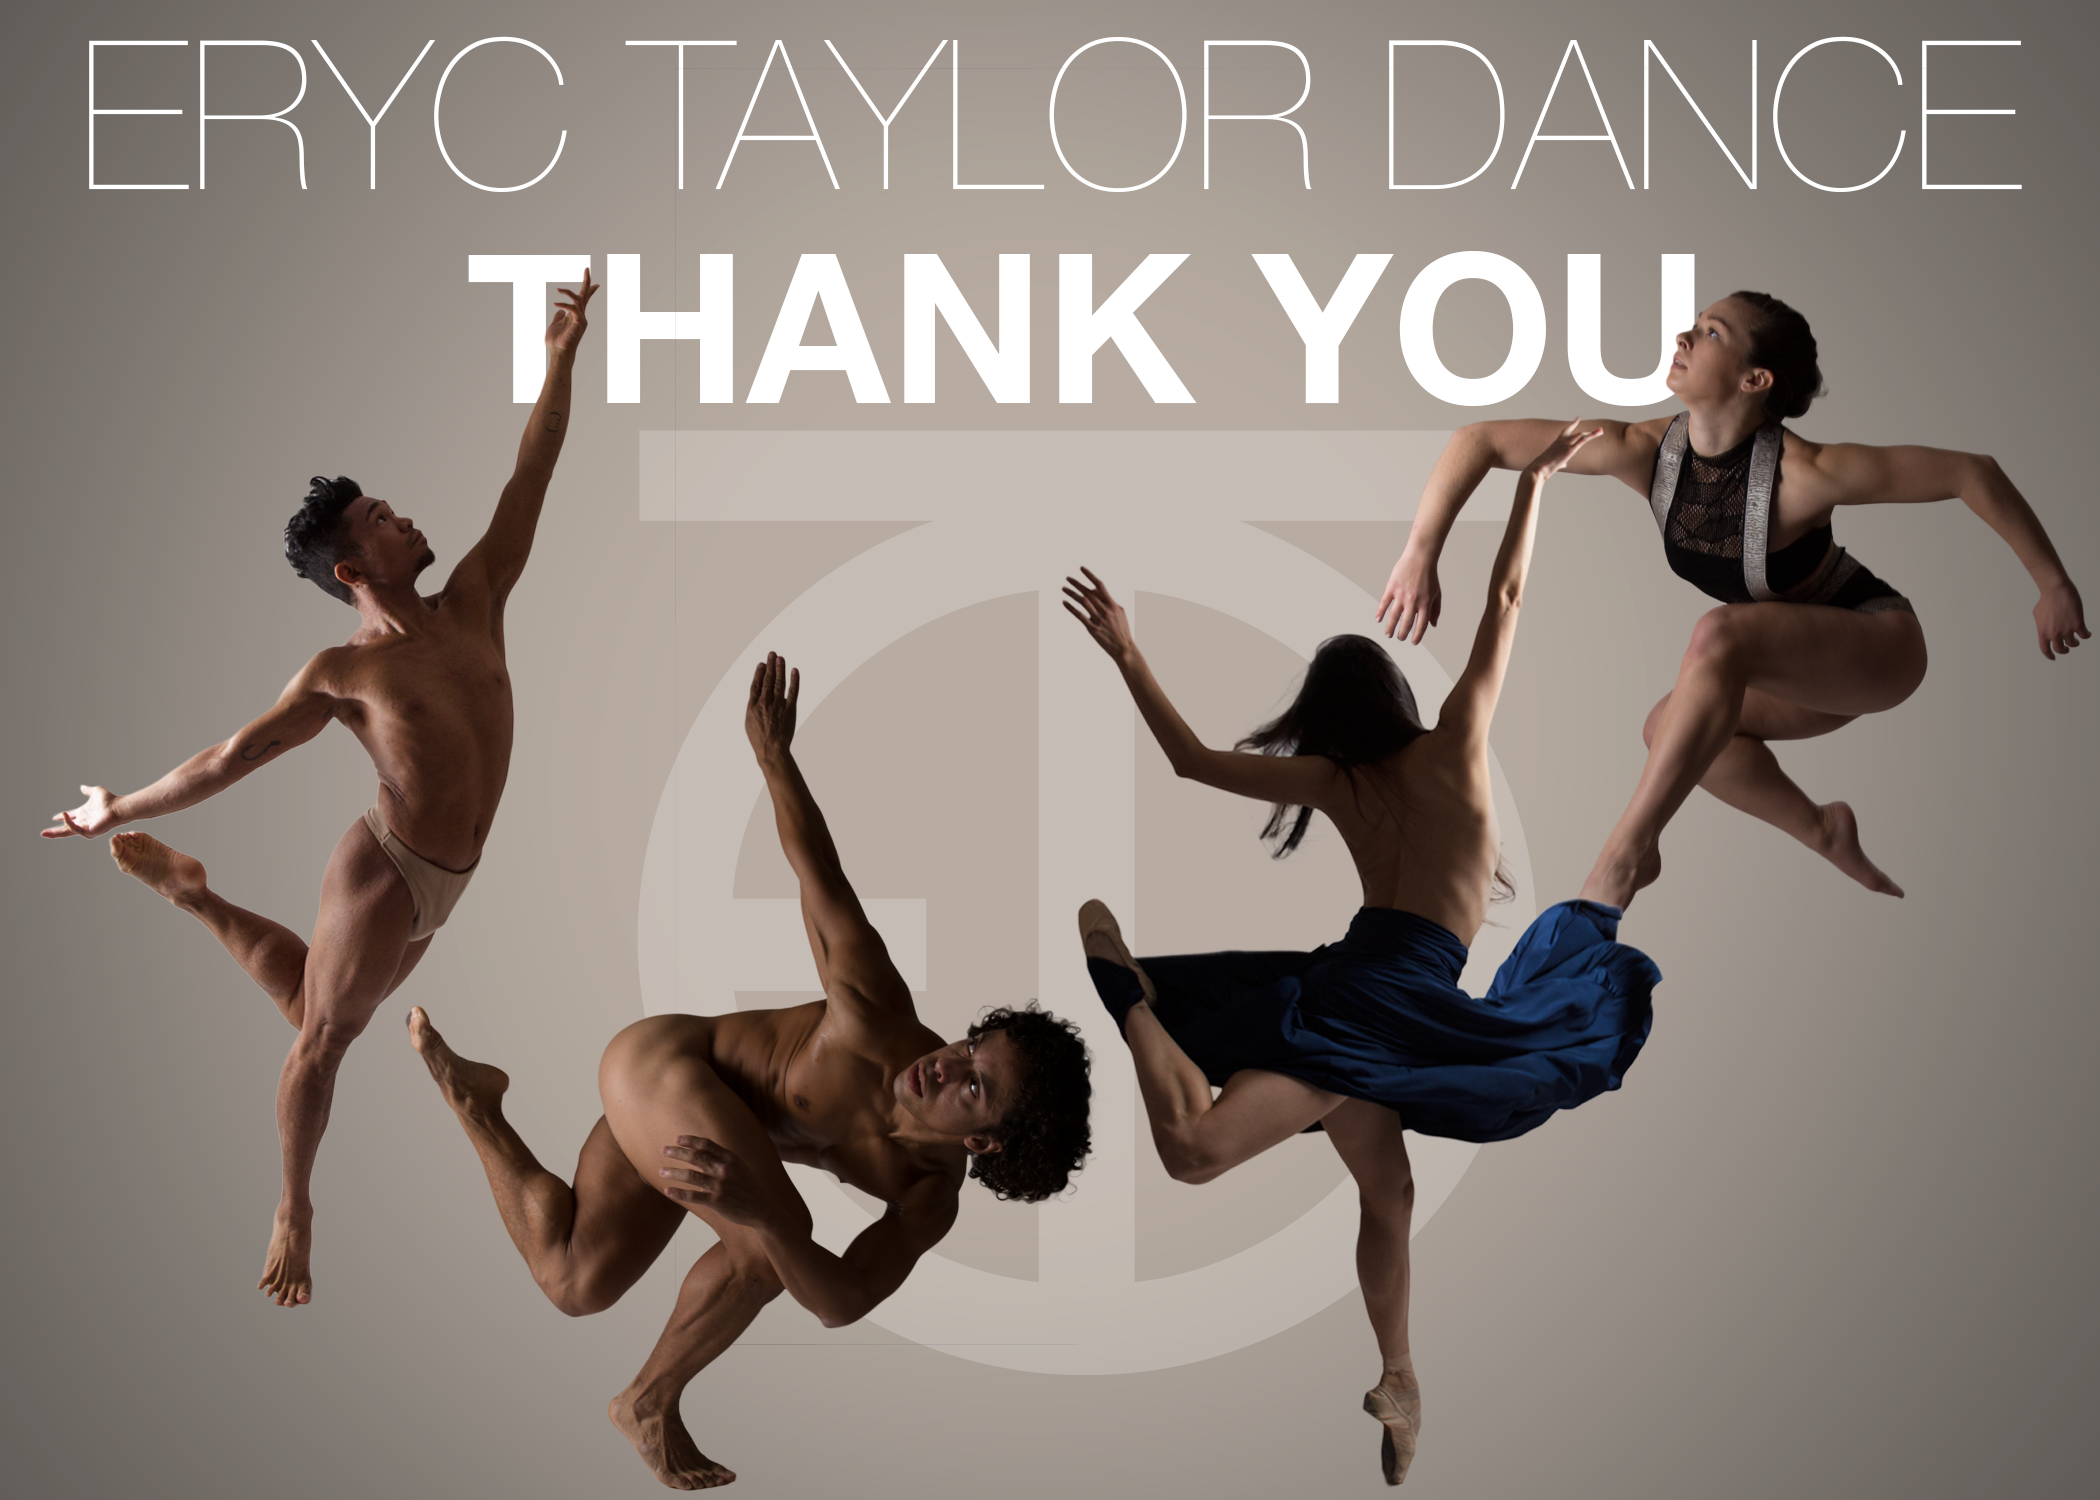 Photos: Kristina Zaidner Photography Dancers: AJ Guevara, Chris Bell, Shoko Fujita, Nicole Baker